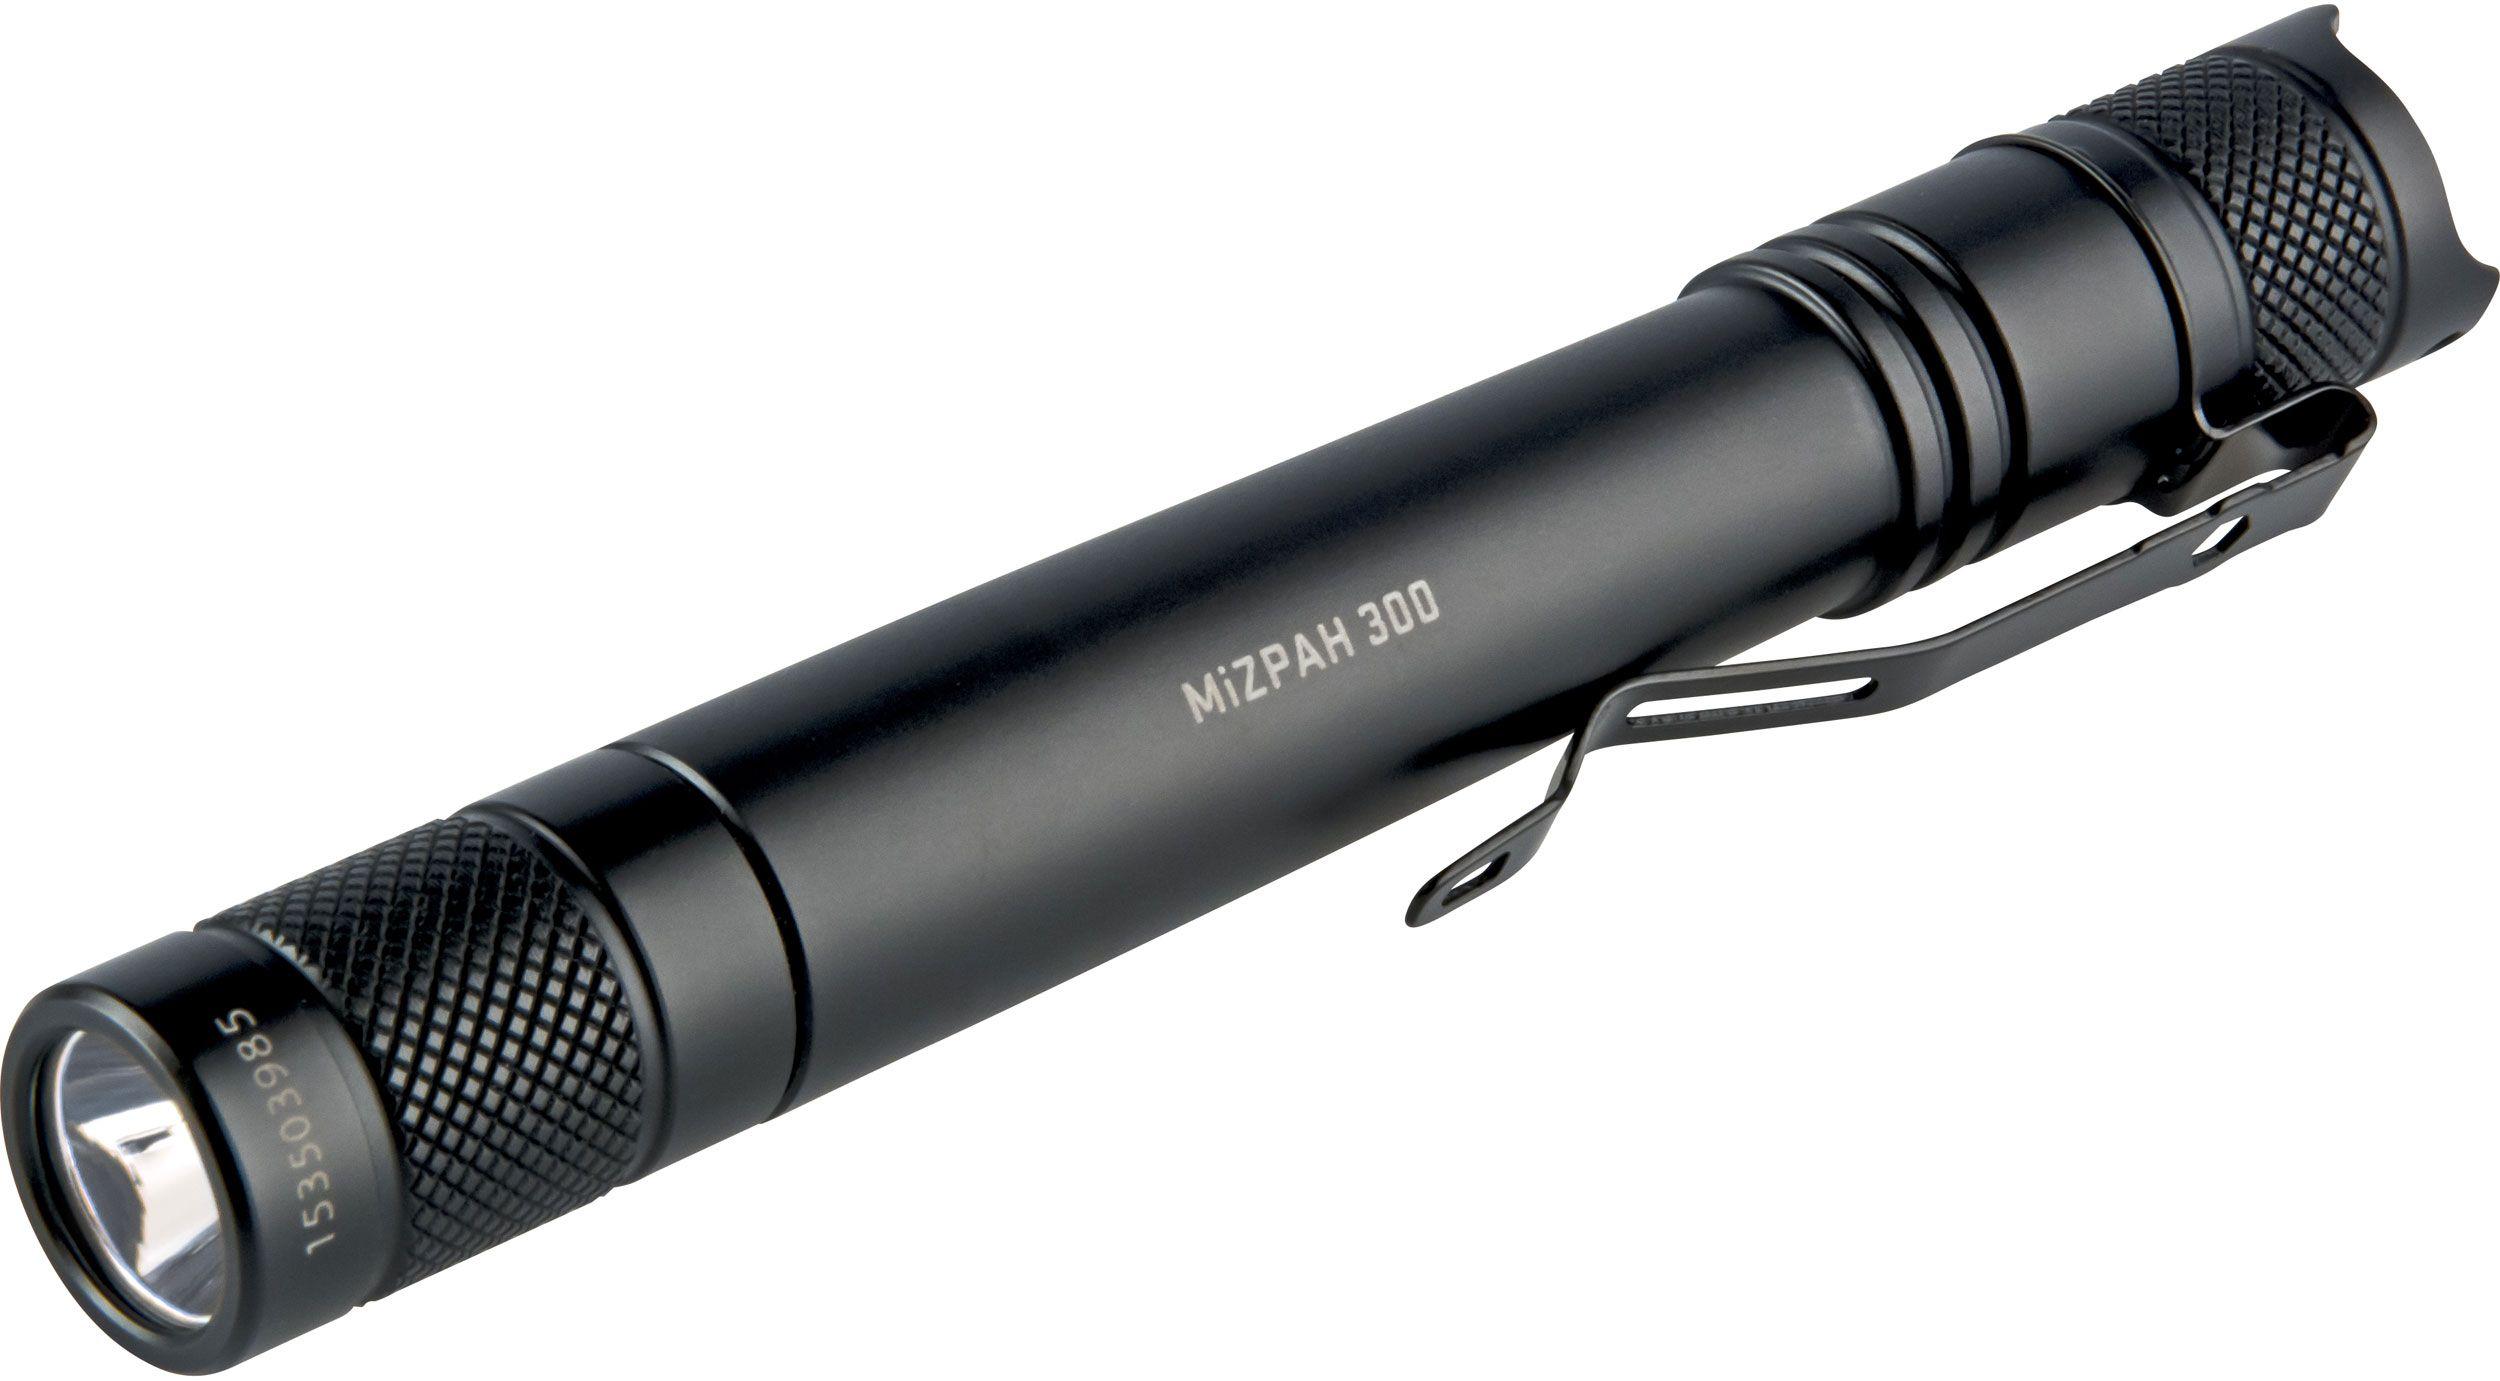 Factor Equipment FM004 MiZPAH 300 LED Flashlight, Black, 300 Max Lumens